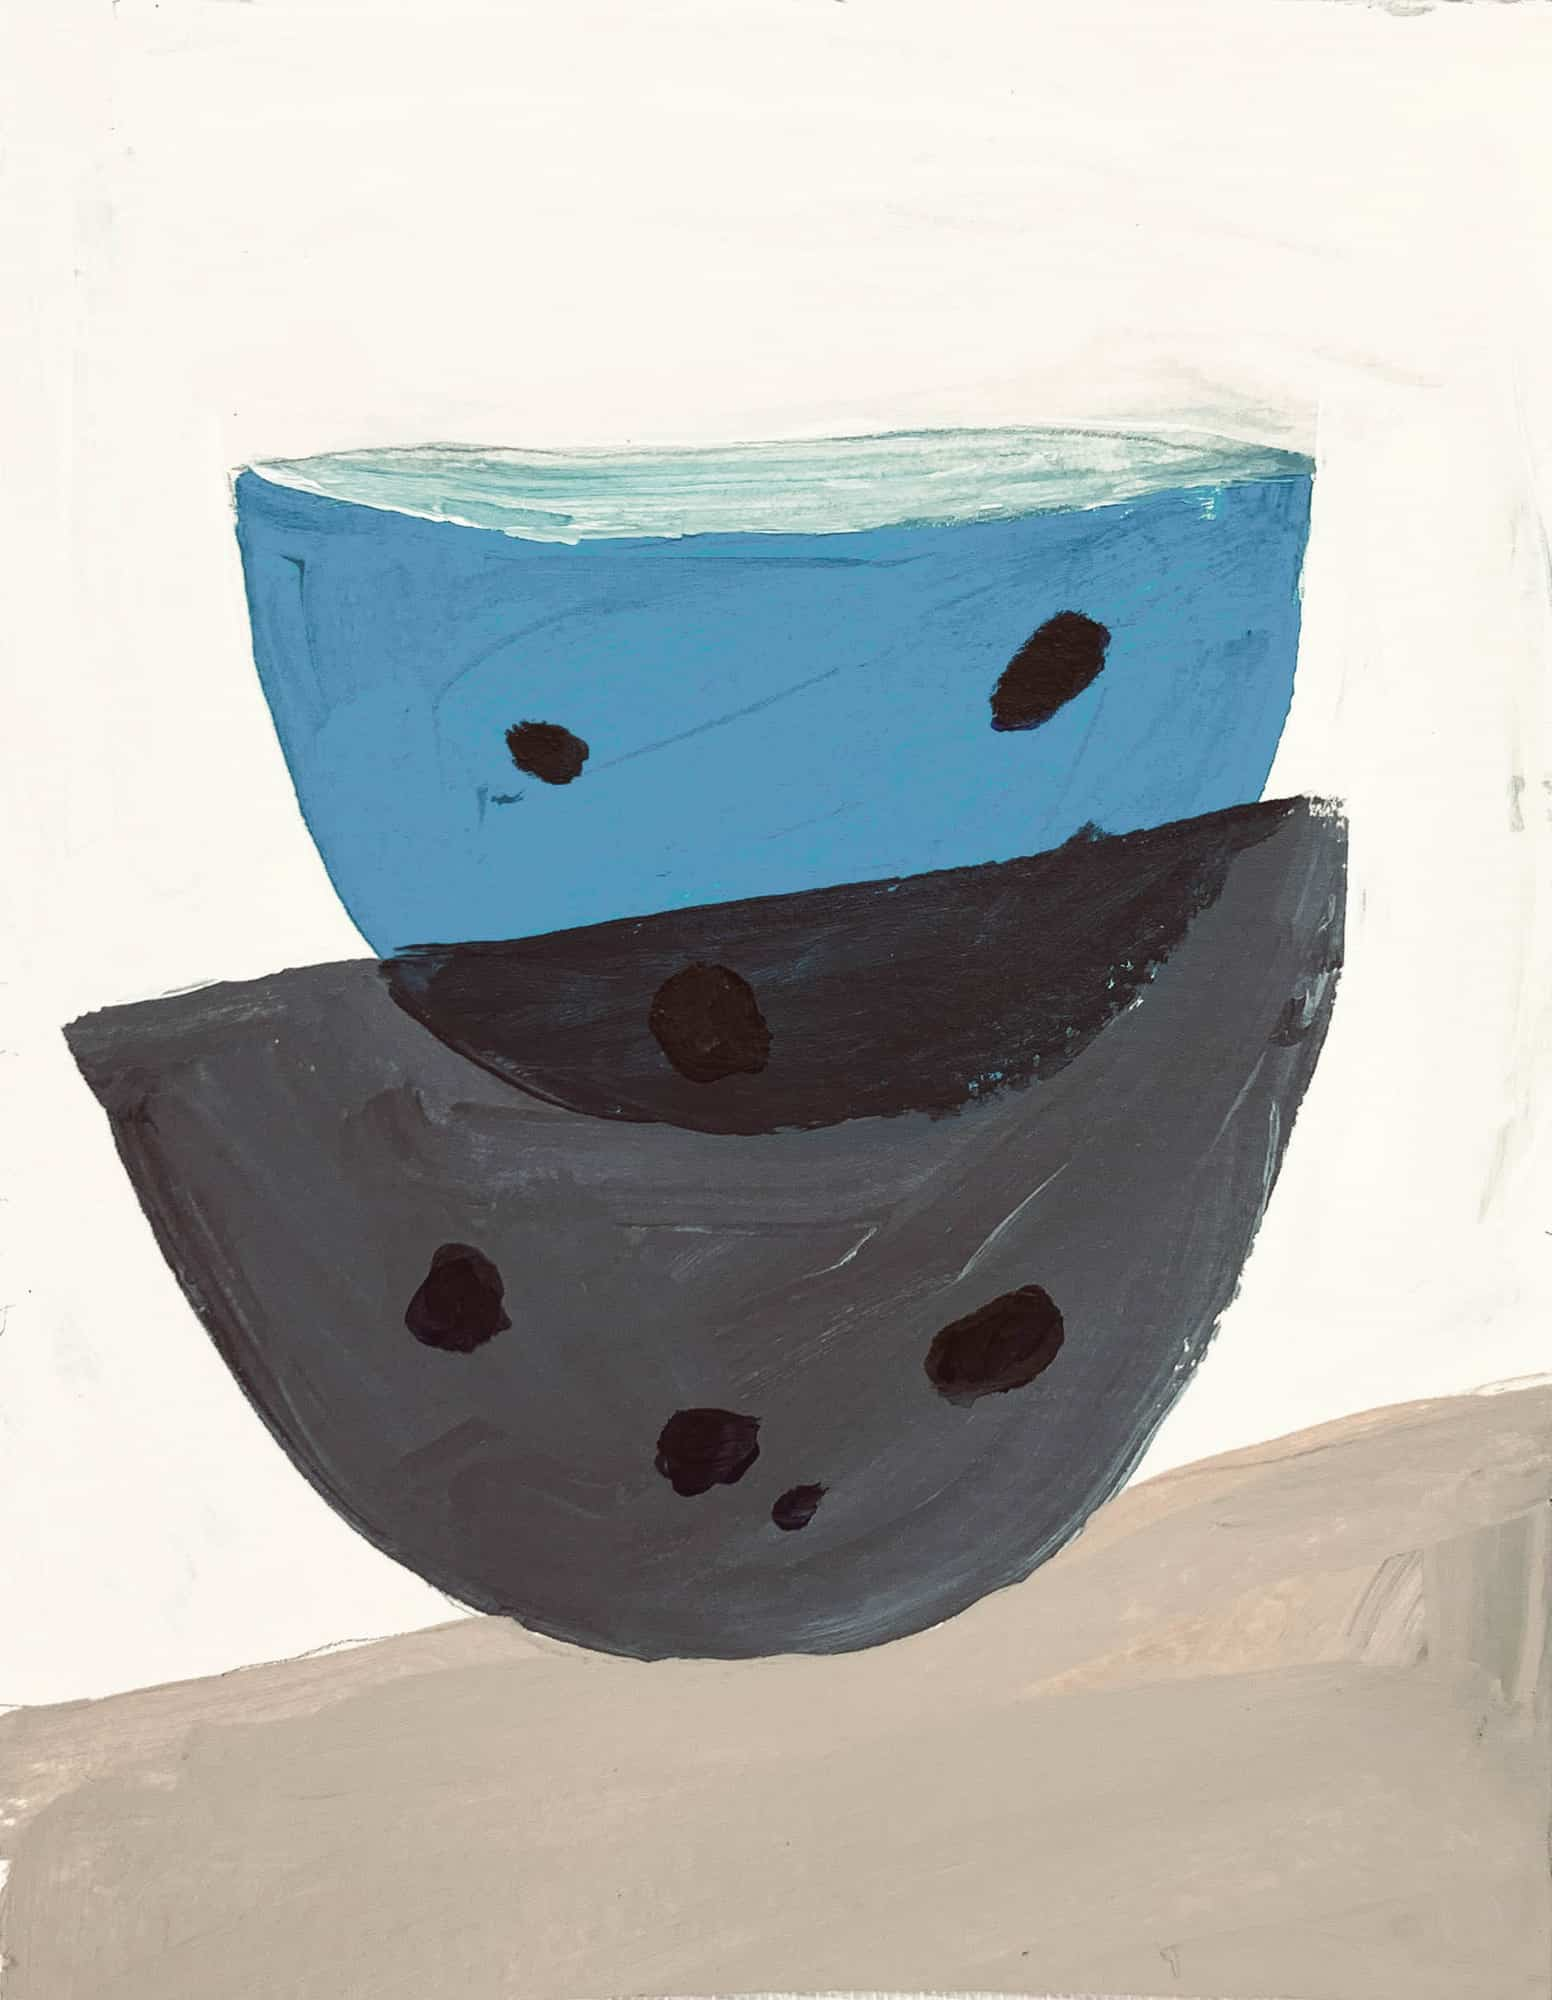 Ölgemälde auf Leinwand blau graue Schüsseln